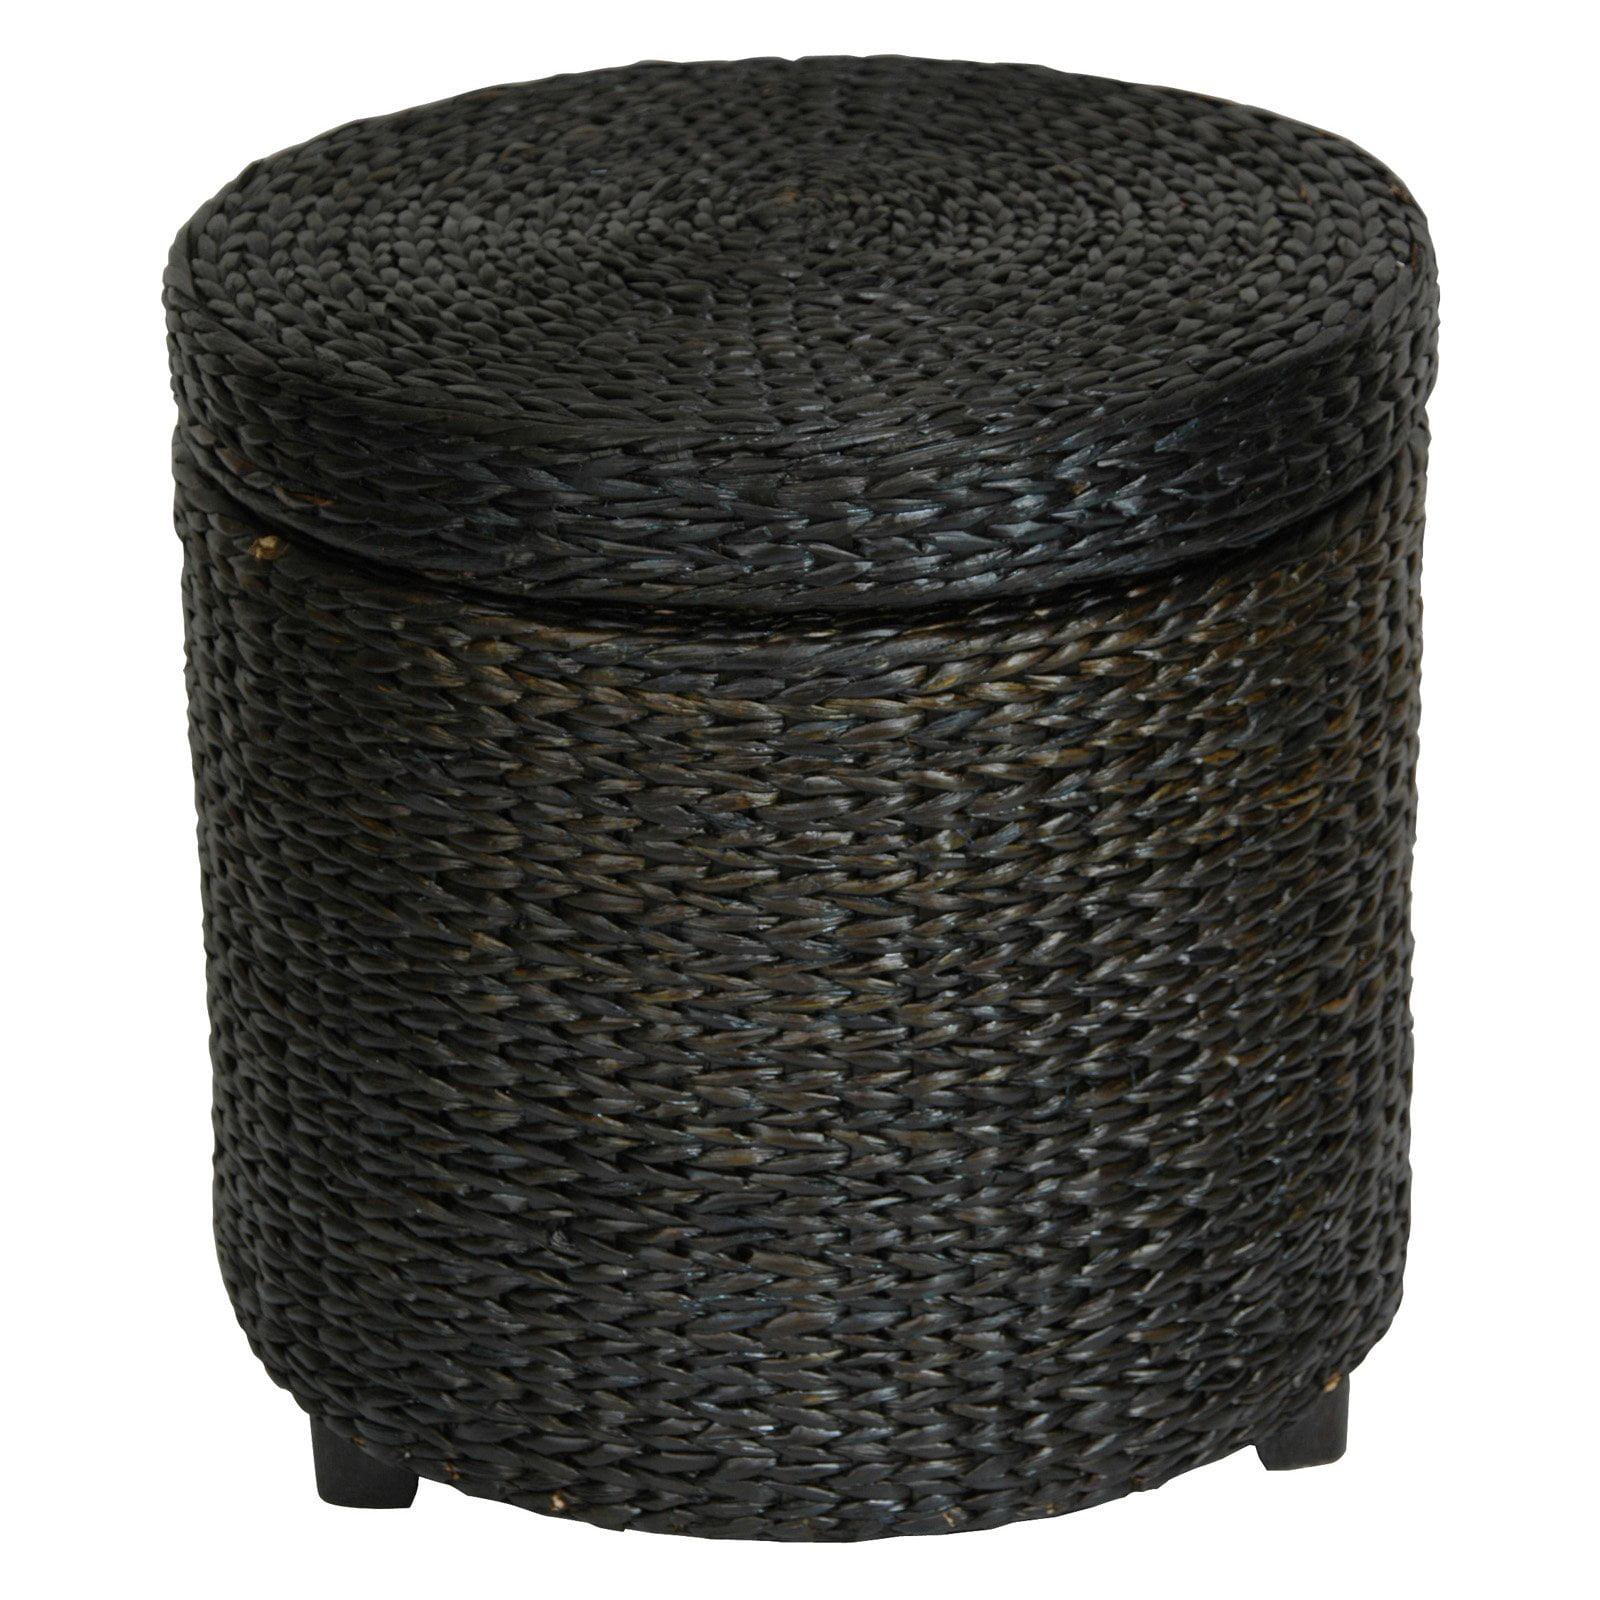 Rush Grass Storage Footstool